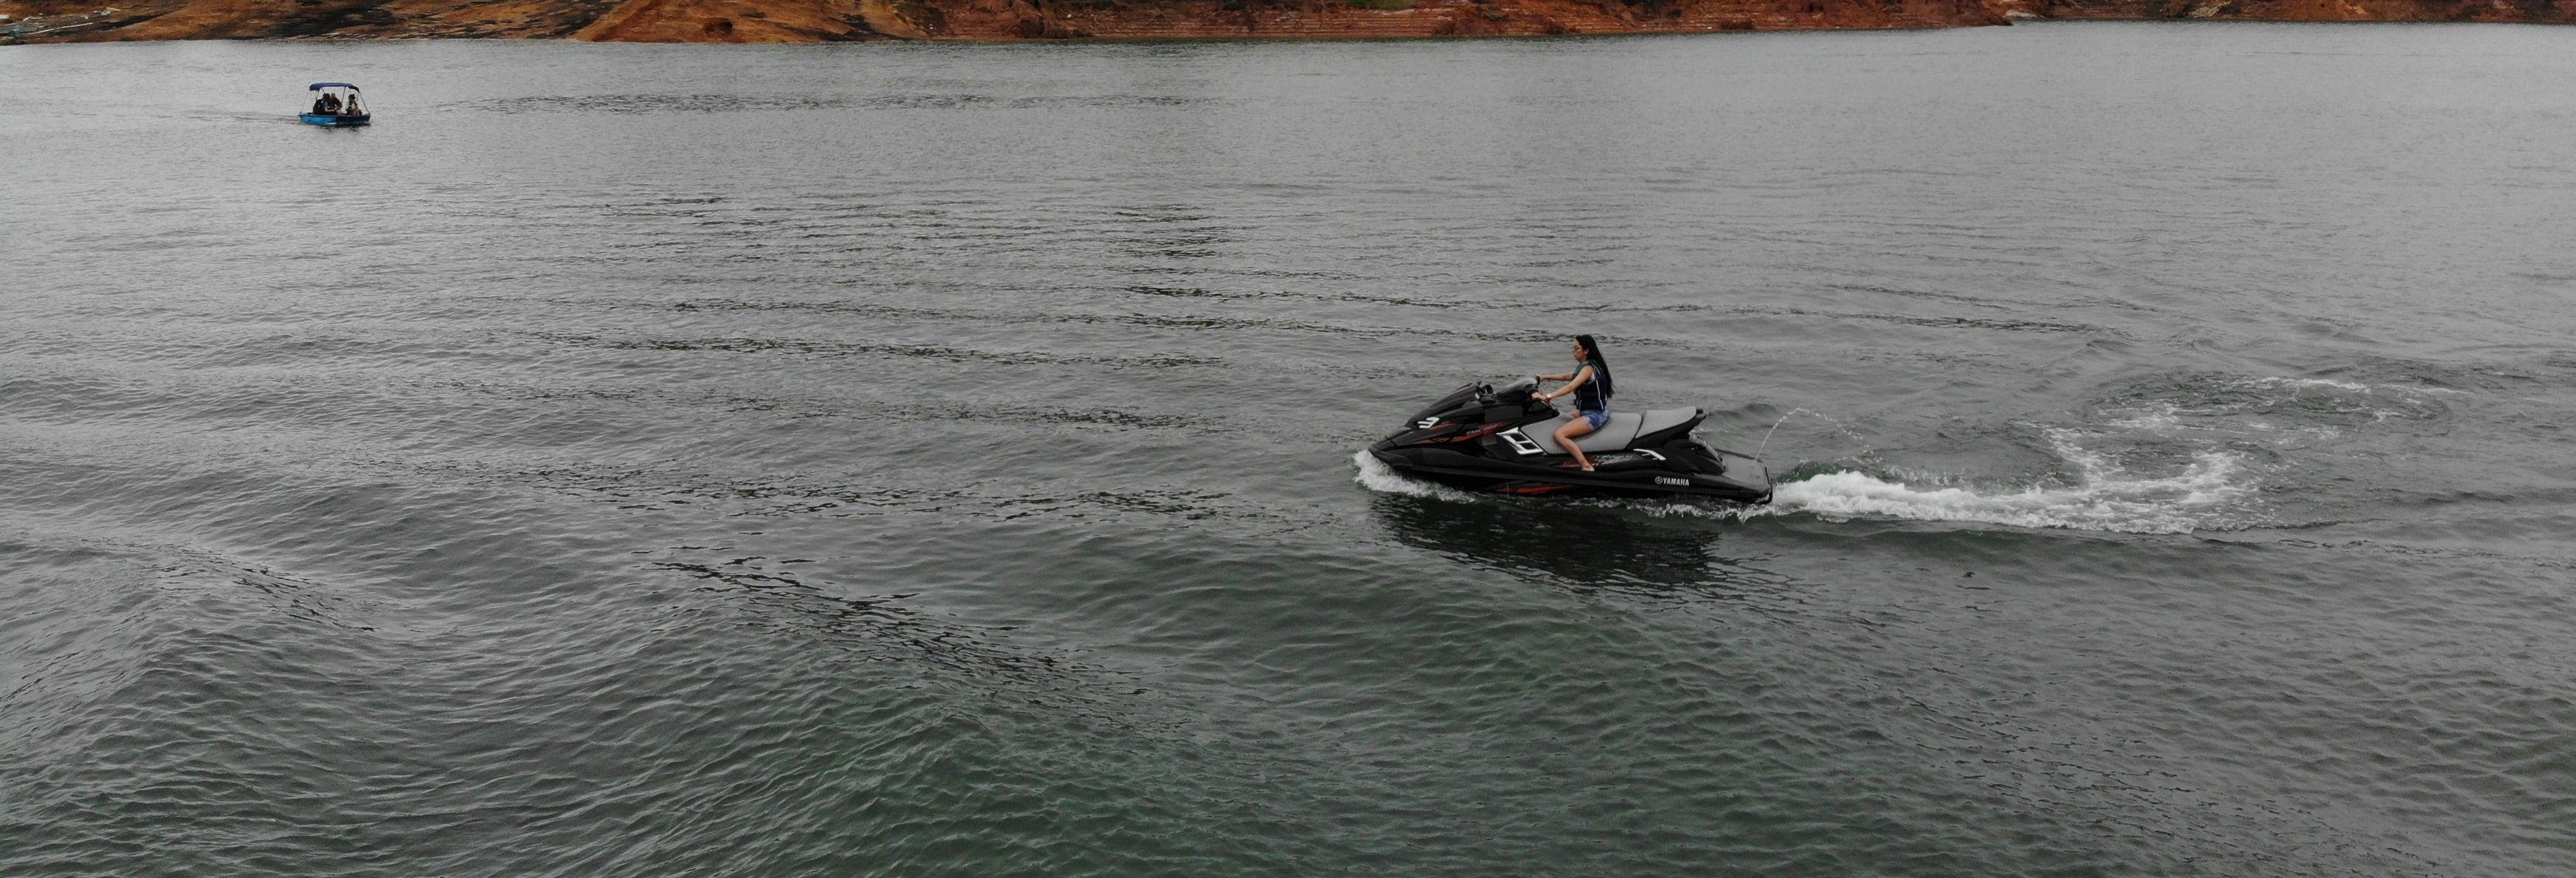 Alquiler de moto de agua en el embalse de Guatapé